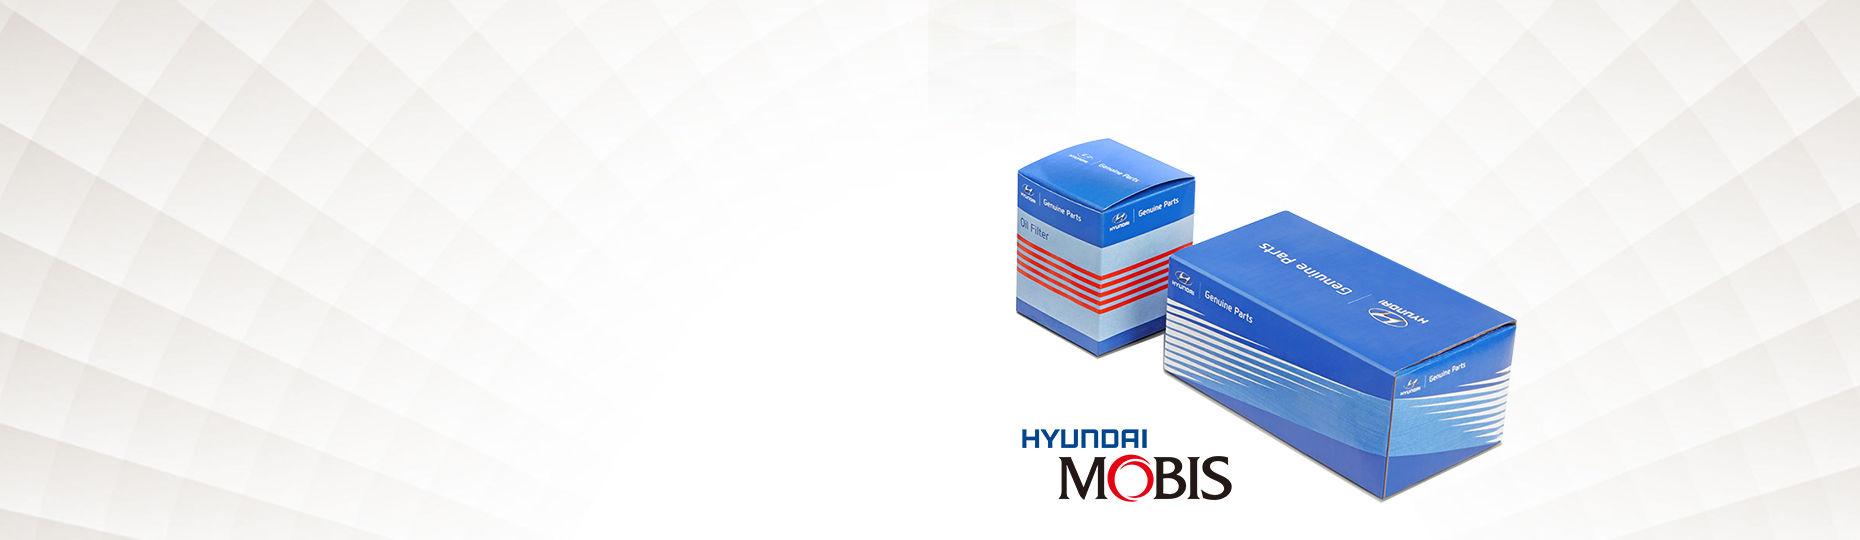 Genuine Parts Hyundai Parts Mobis Hyundai Motor India